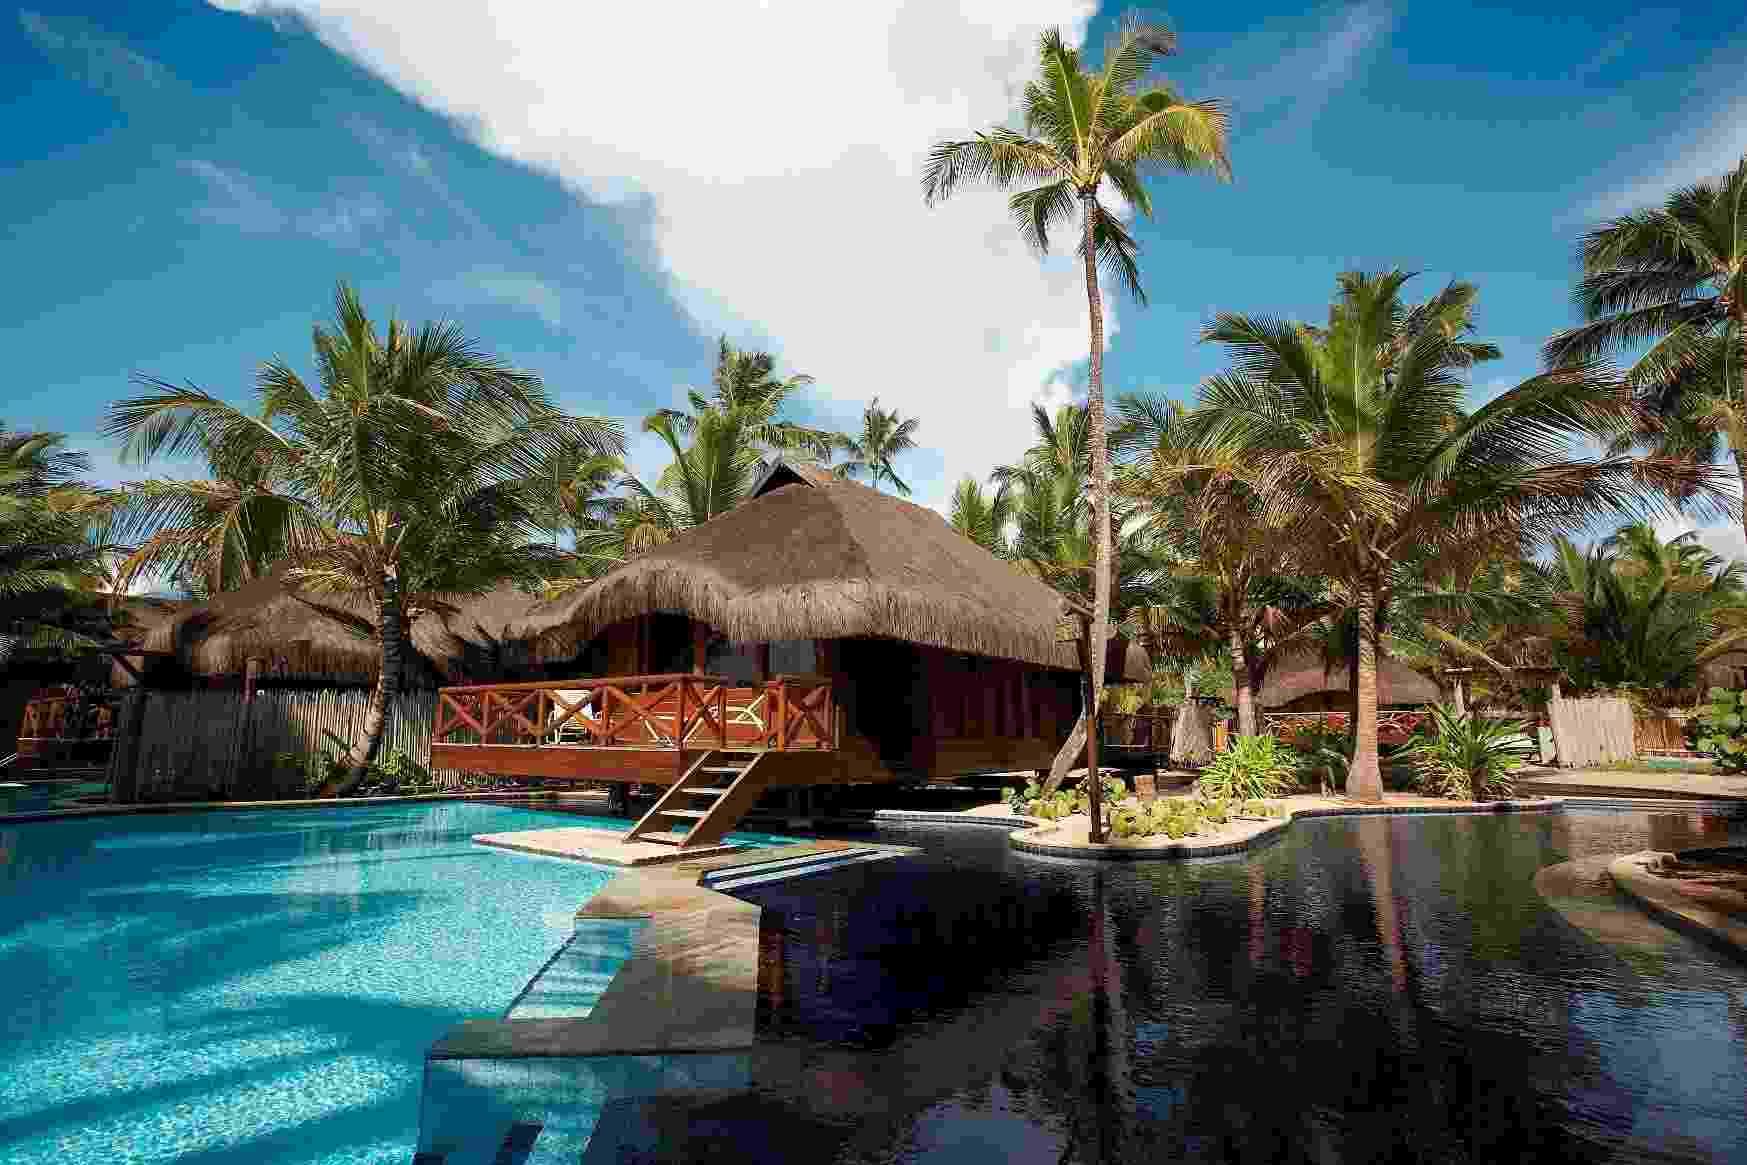 Nannai Resort & Spa, em Pernambuco - Divulgação/Nannai Resort & Spa